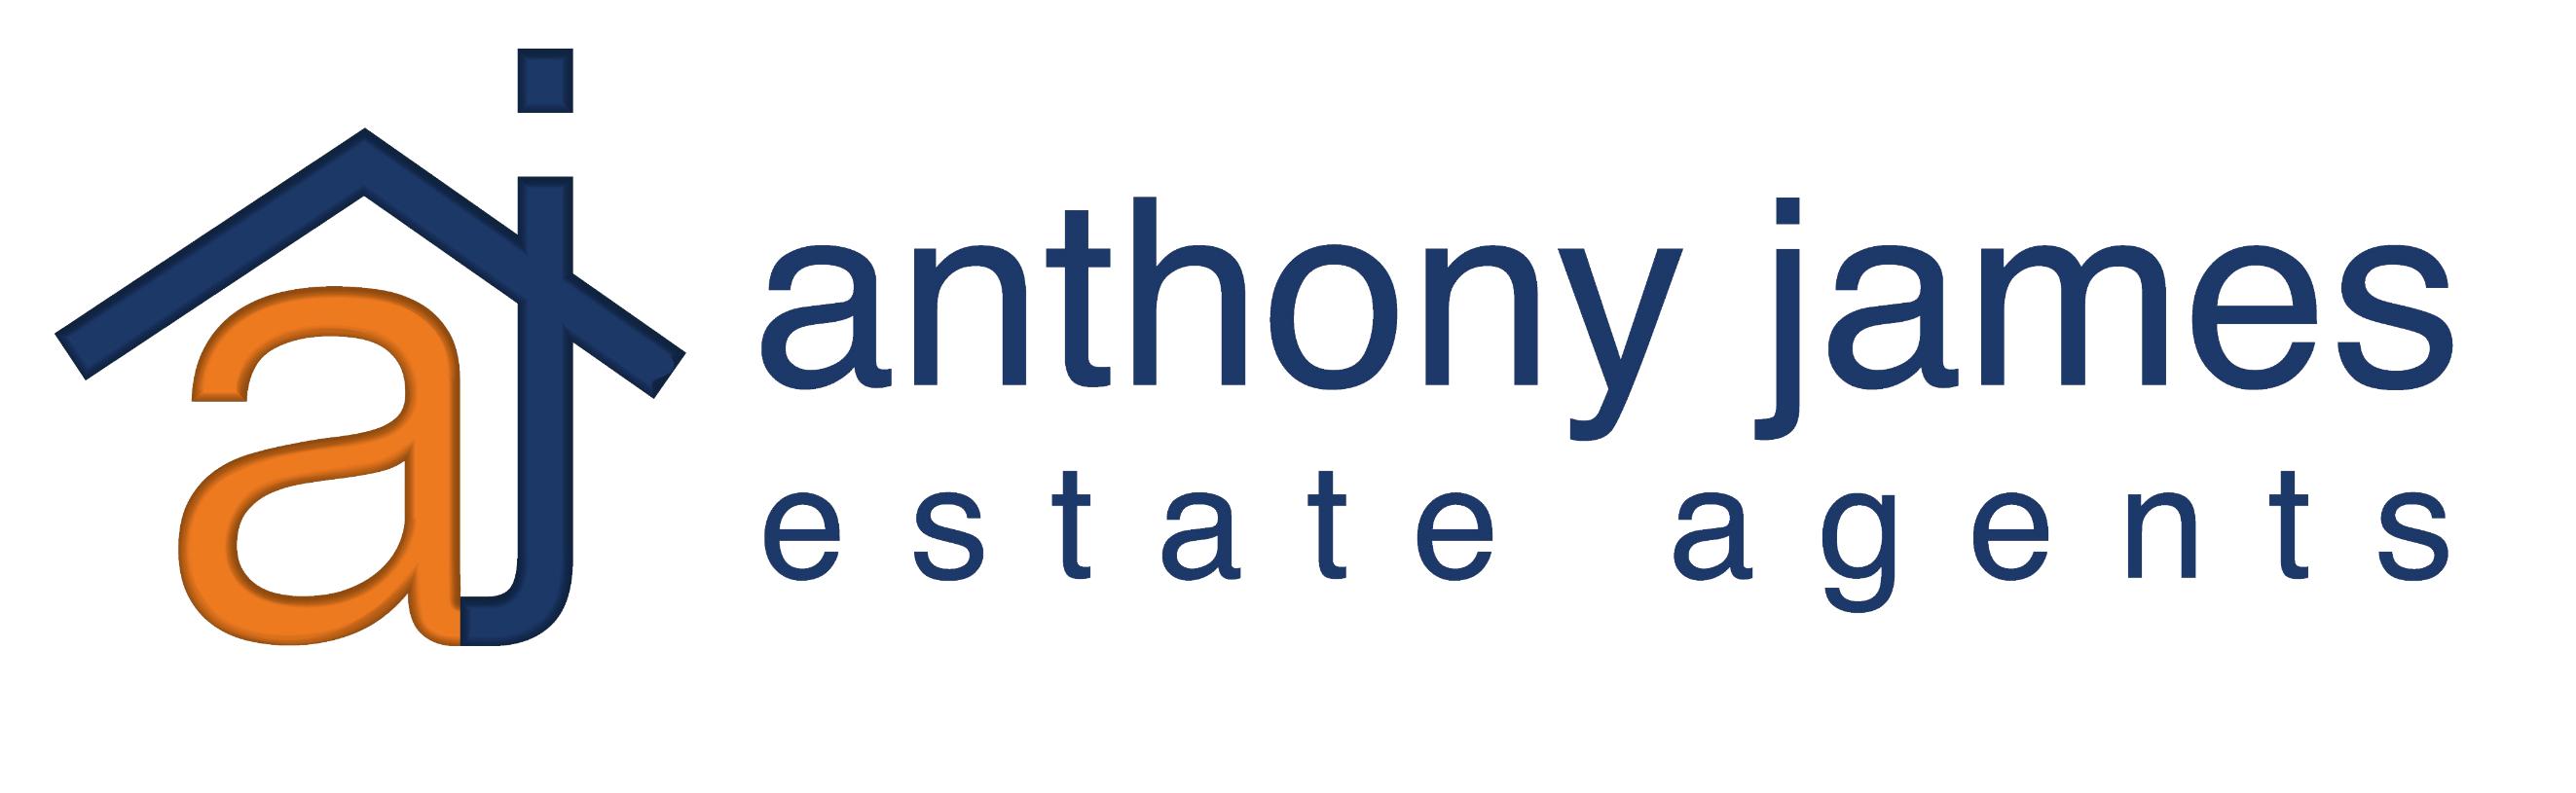 Anthony James Estate Agents